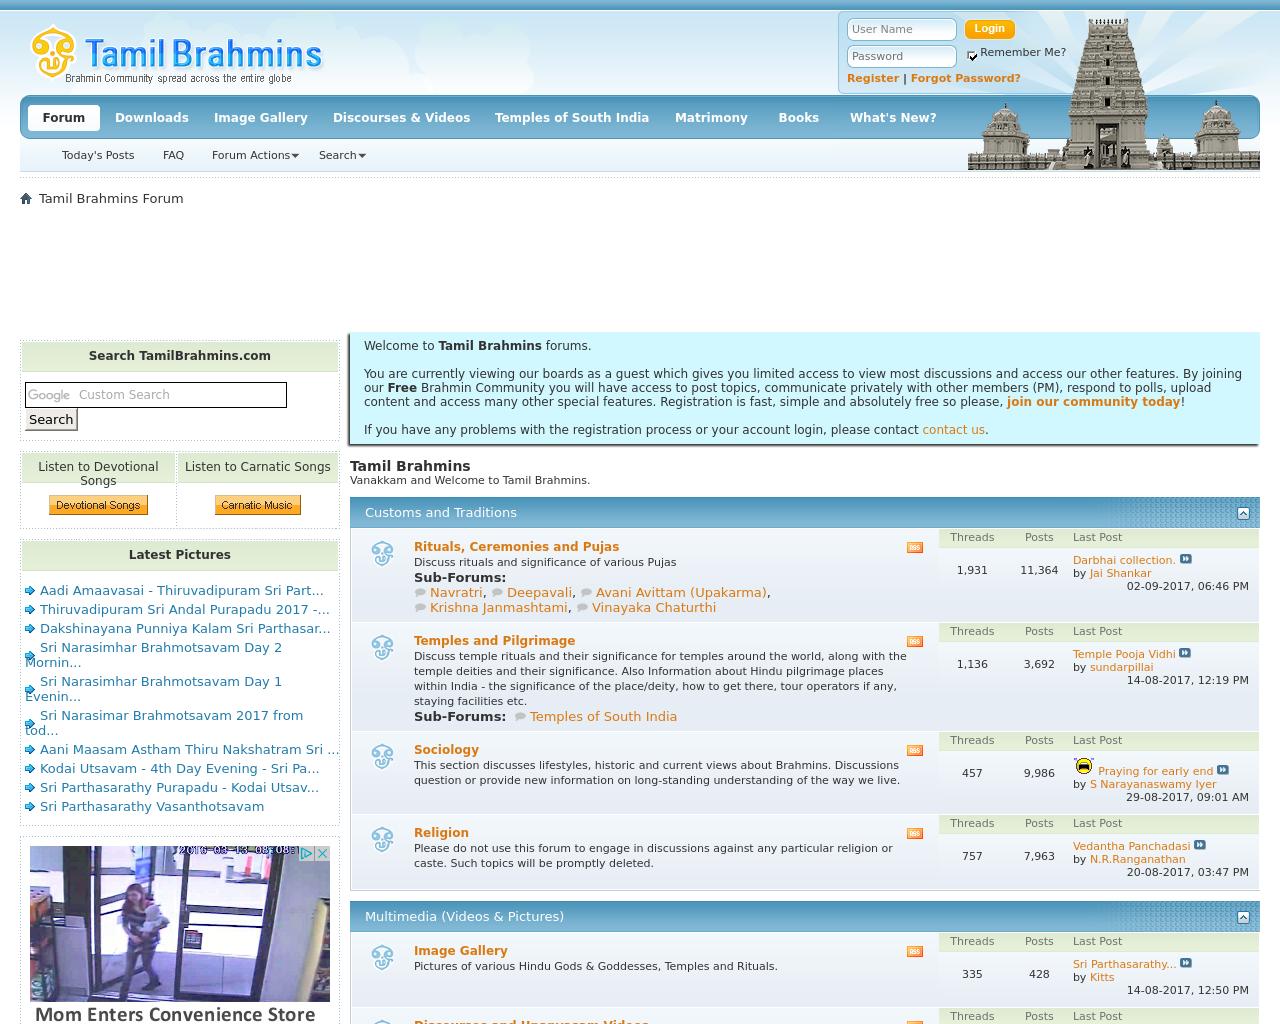 Tamil-Brahmins-Advertising-Reviews-Pricing